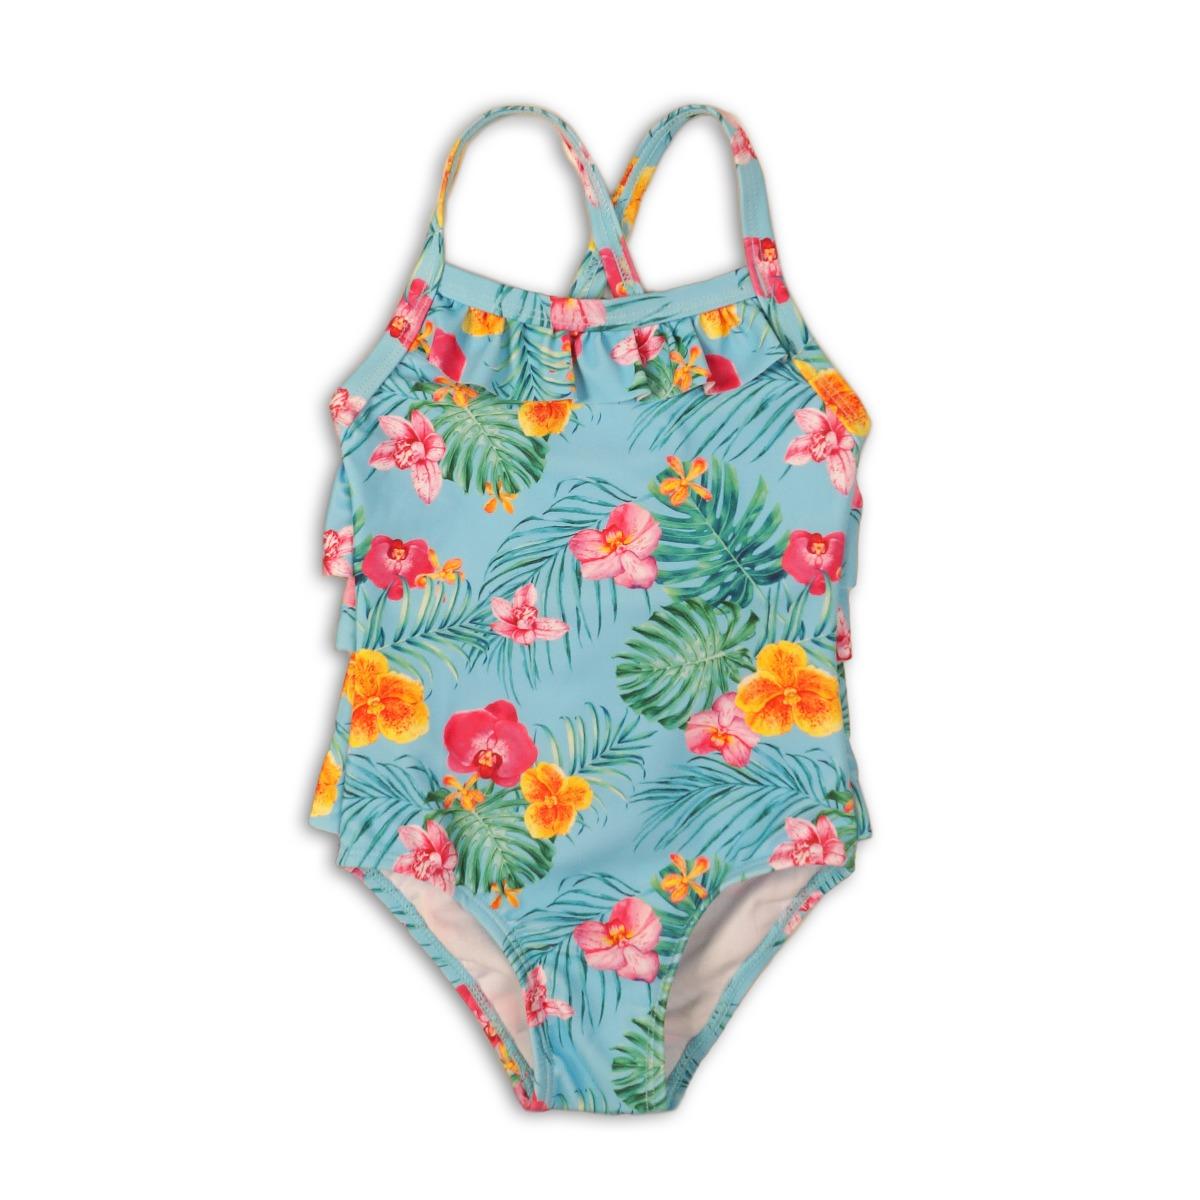 Costum de baie cu imprimeu tropical Minoti Swim imagine